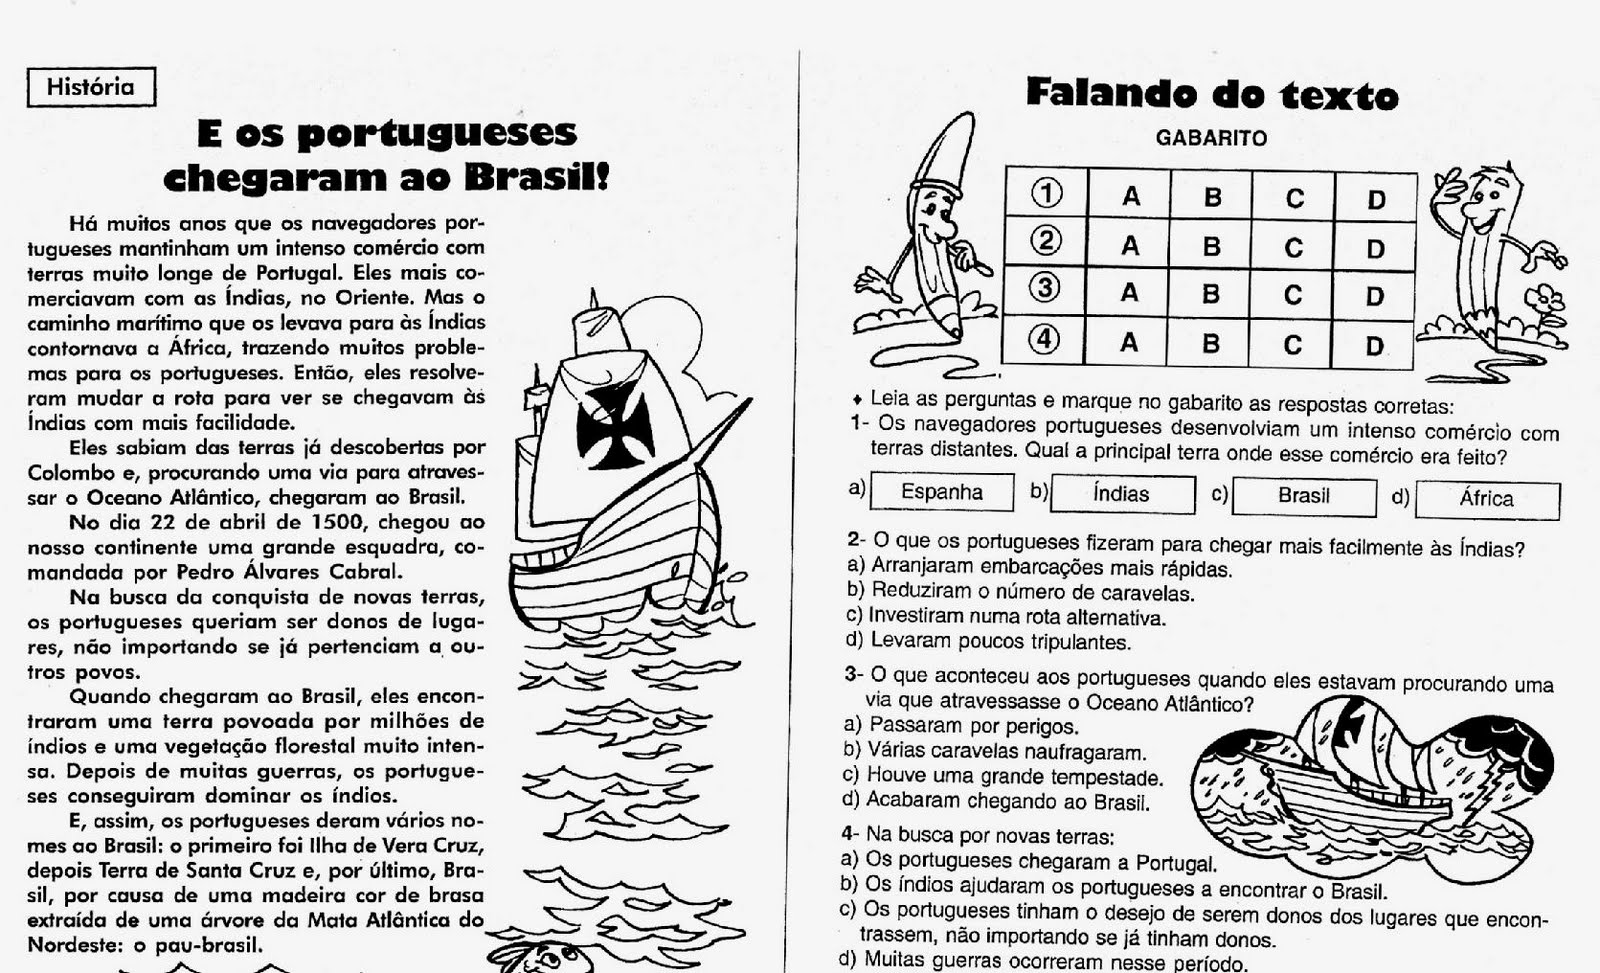 periodo colonial no brasil imagens para colorir